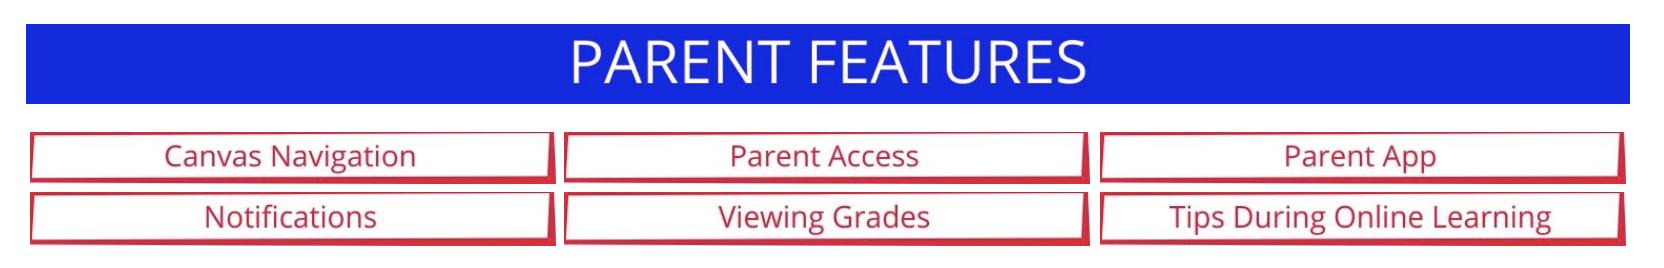 Parent Canvas Resource image